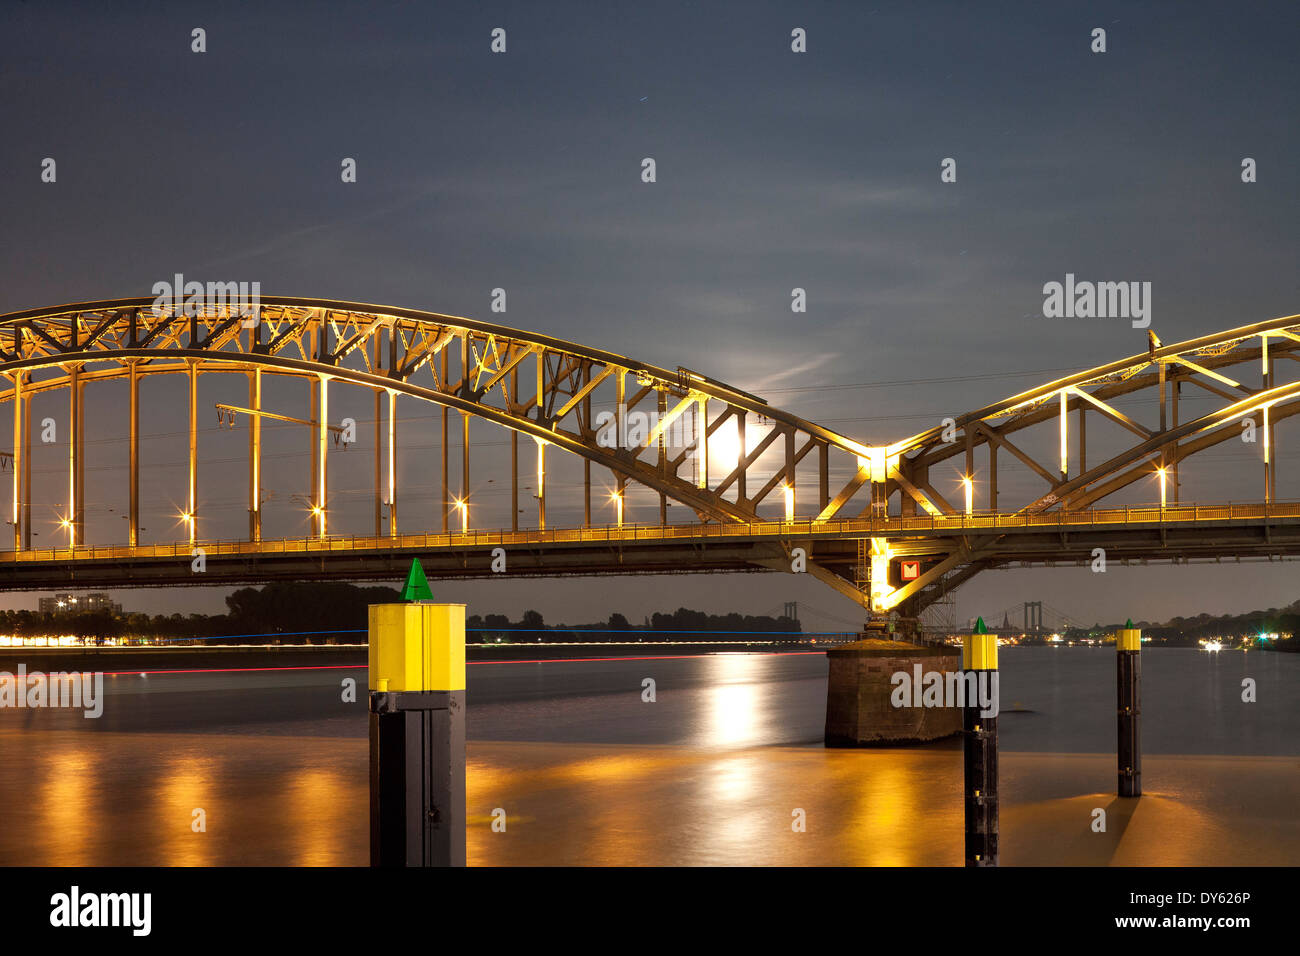 Railway bridge across the river Rhine, Cologne, North Rhine-Westfalia, Germany, Europe - Stock Image